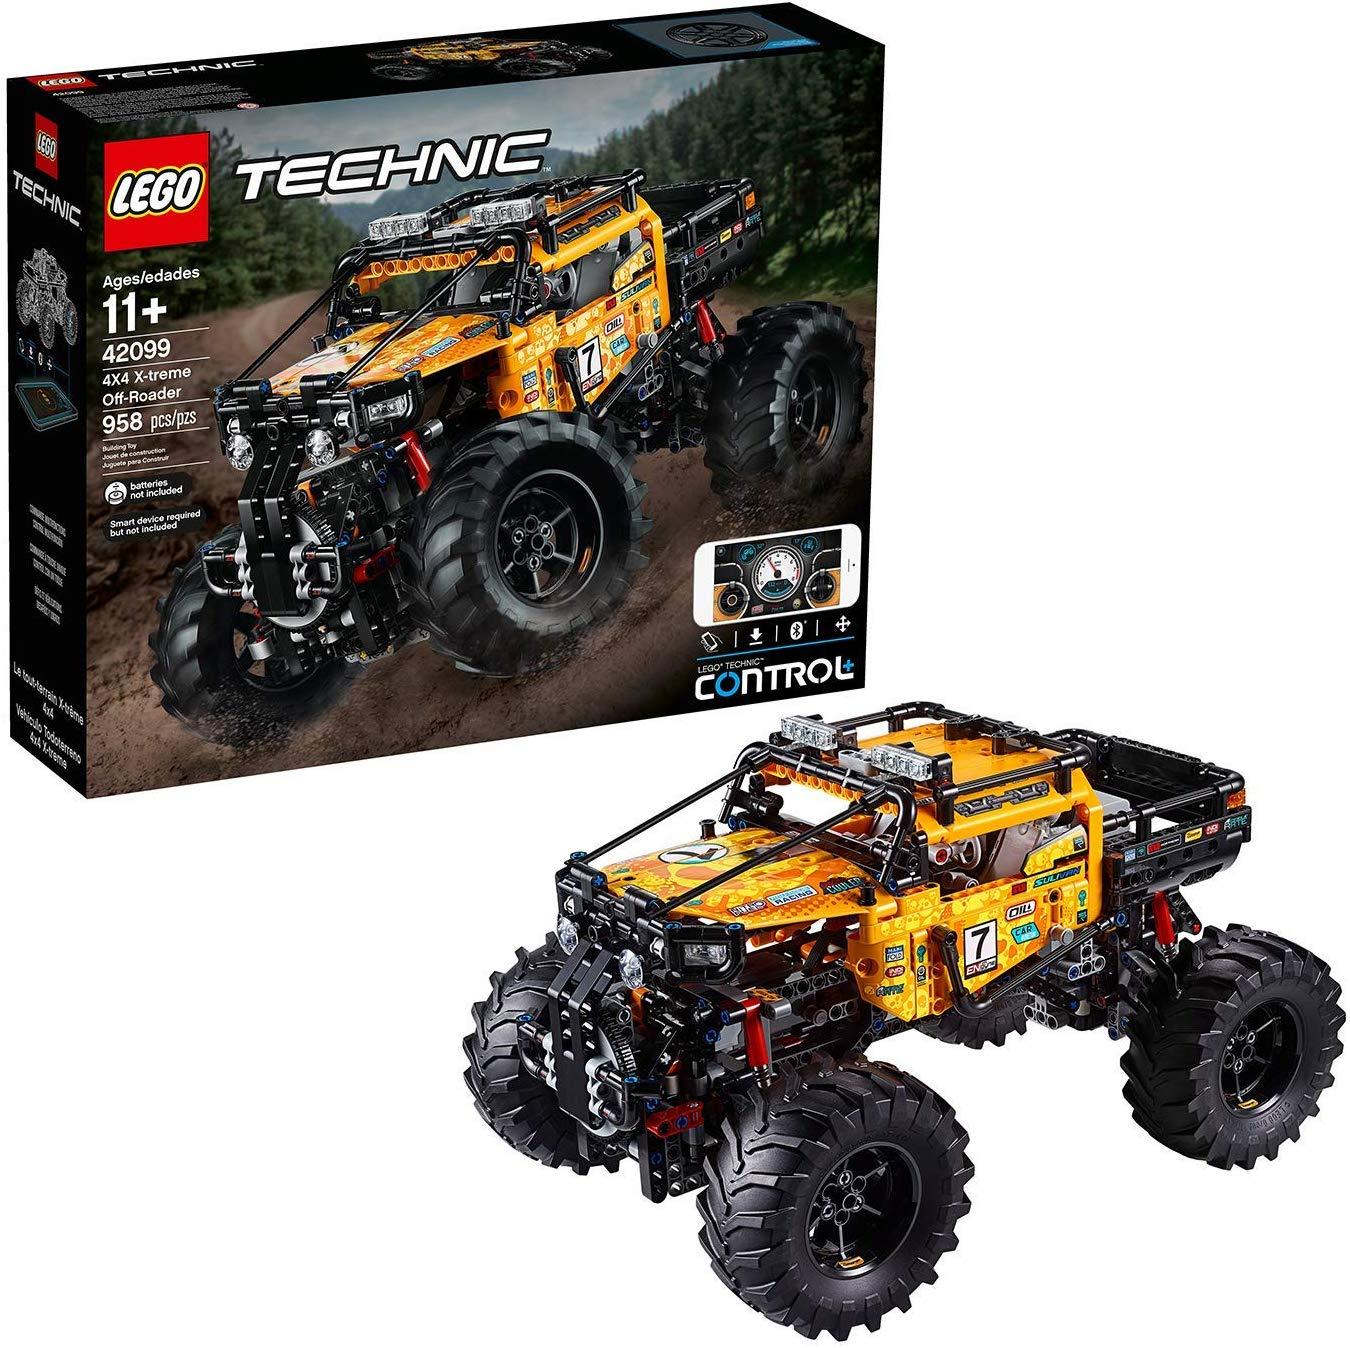 Jouet Lego Technic 42099 4x4 X-treme Off-Roader